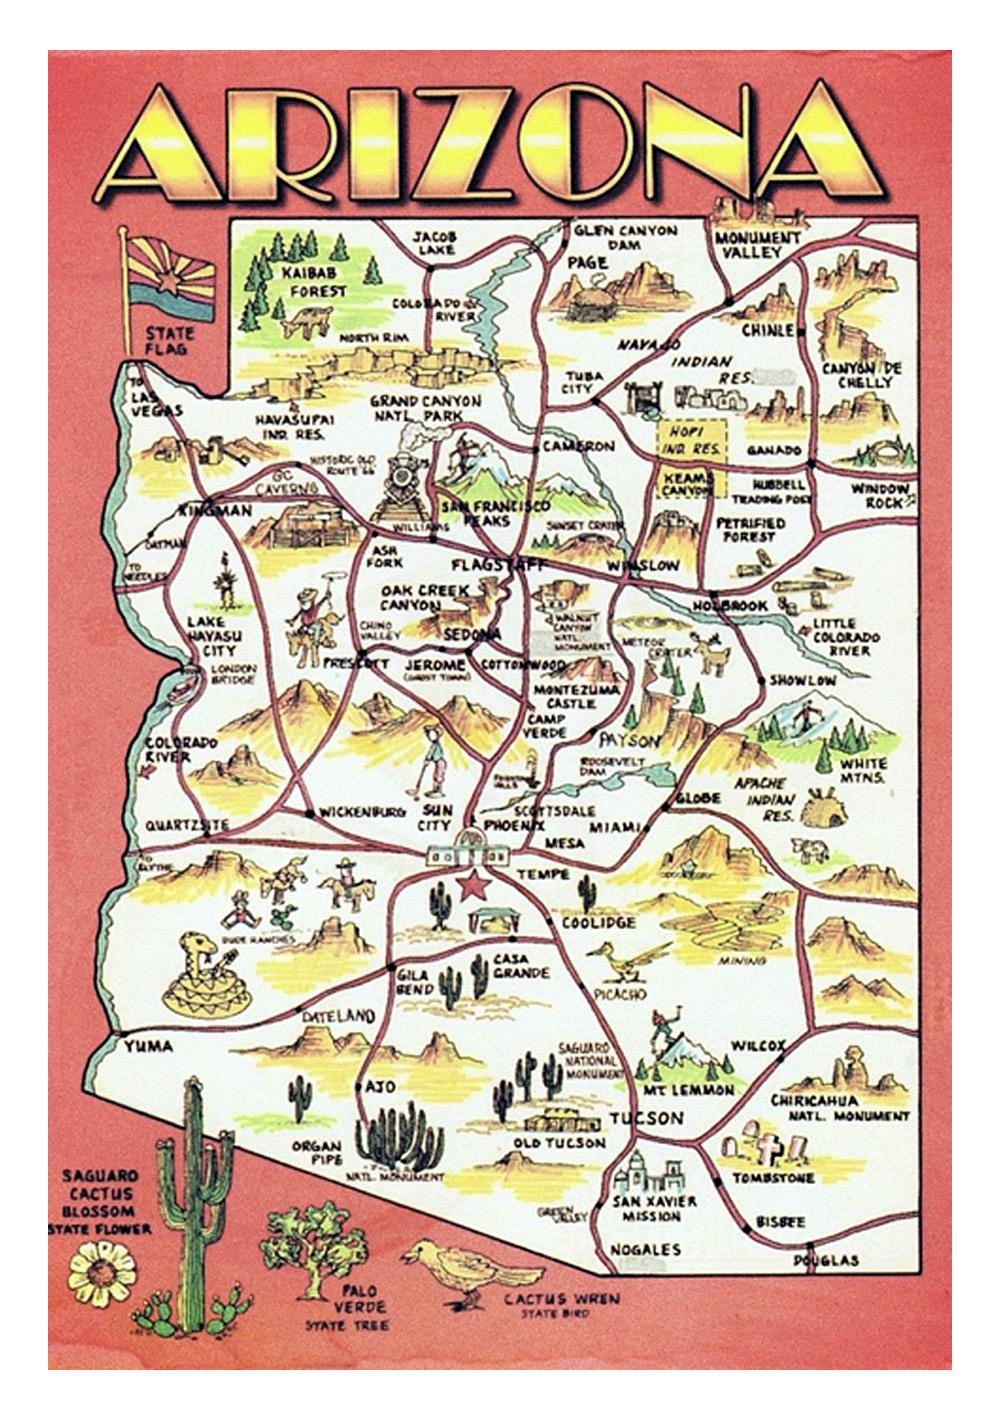 Map Of Arizona Detailed.Detailed Travel Illustrated Map Of Arizona State Arizona State